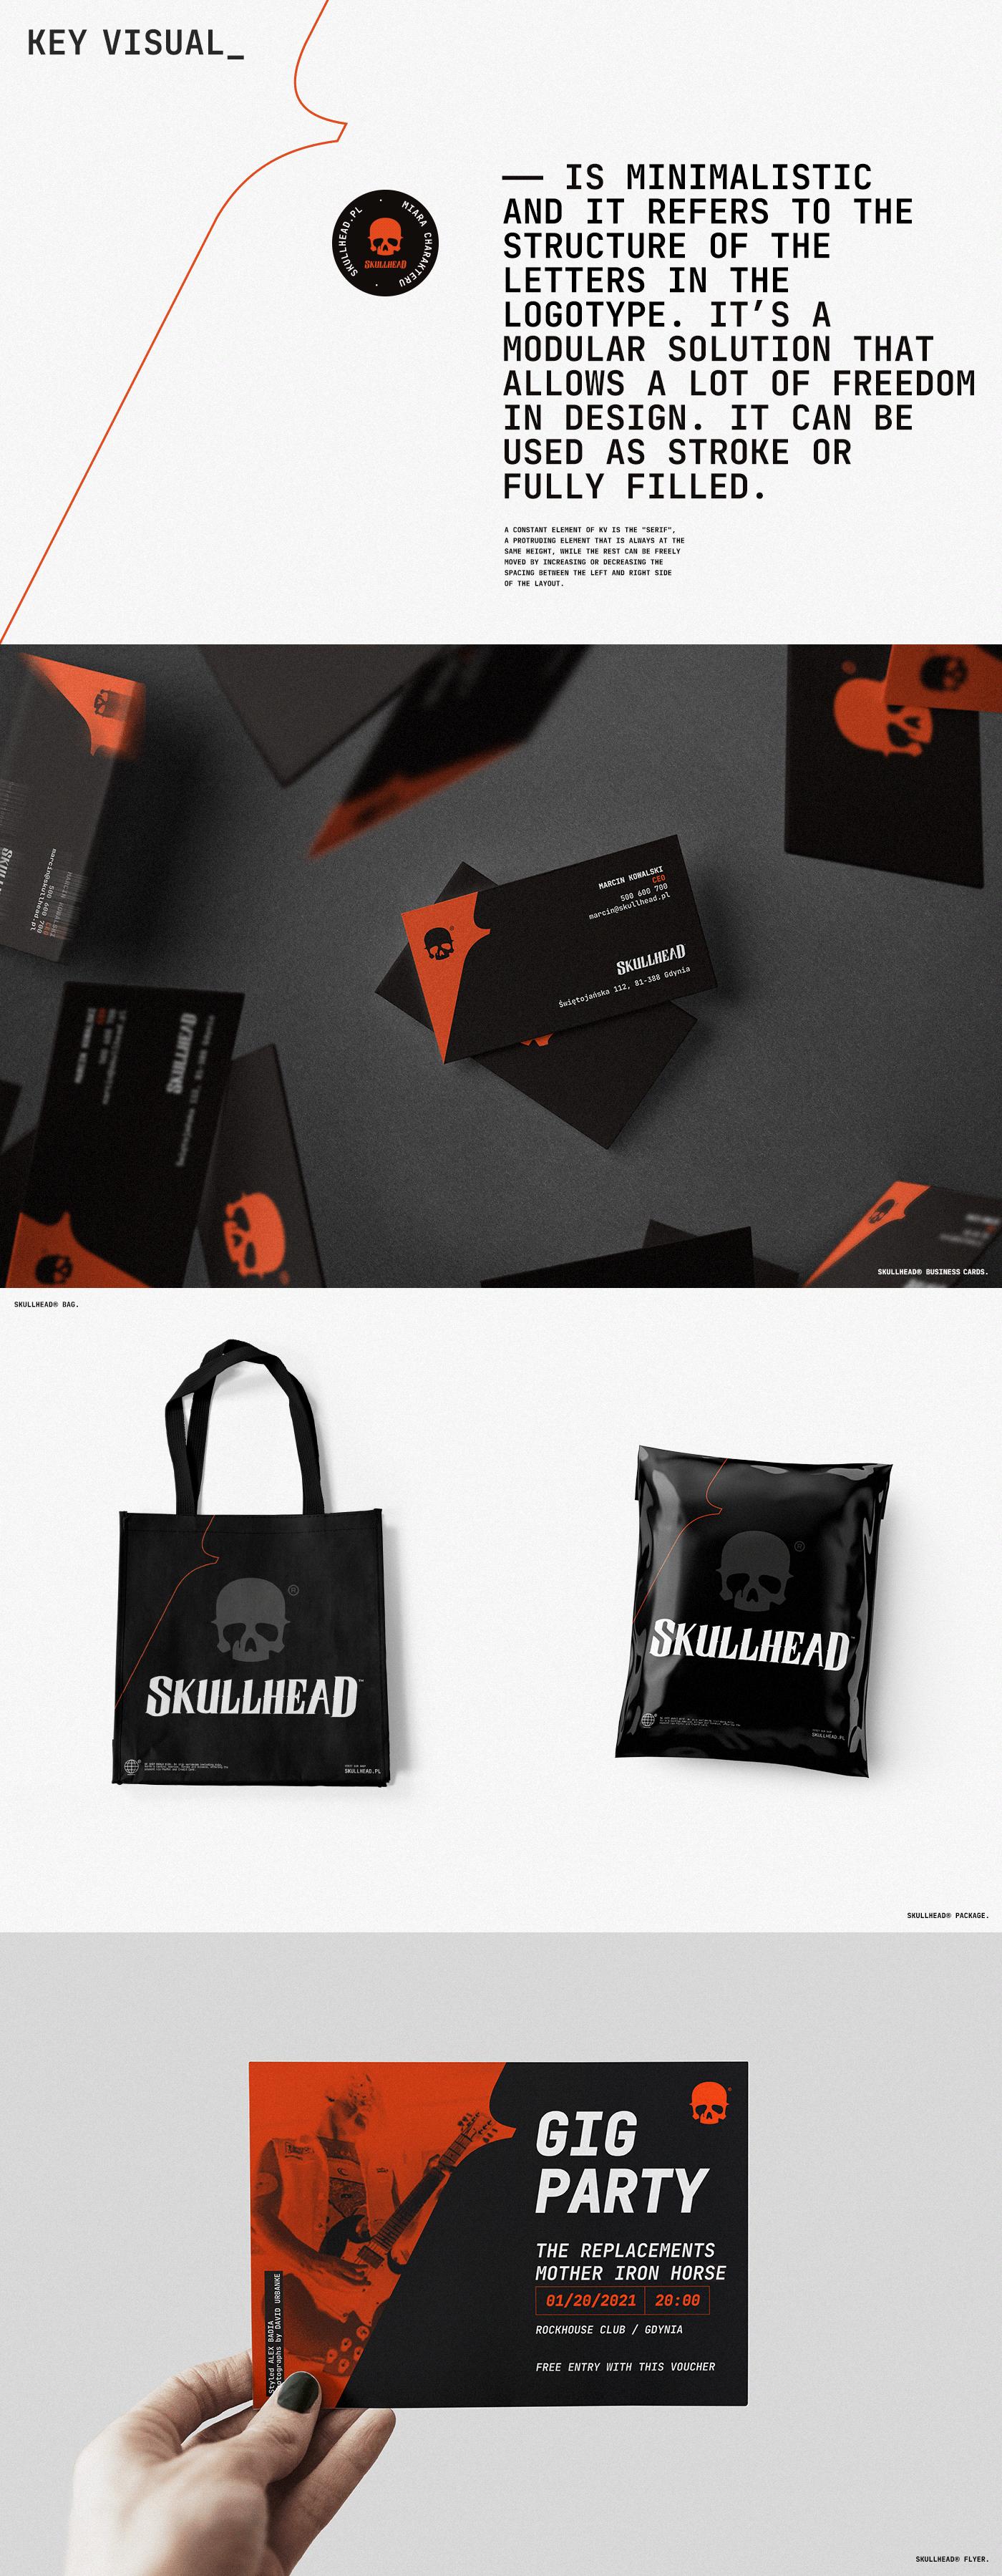 branding  challenge challenge studio clothes fashion brand online store Pitbull skullhead Thor Steinar UX design